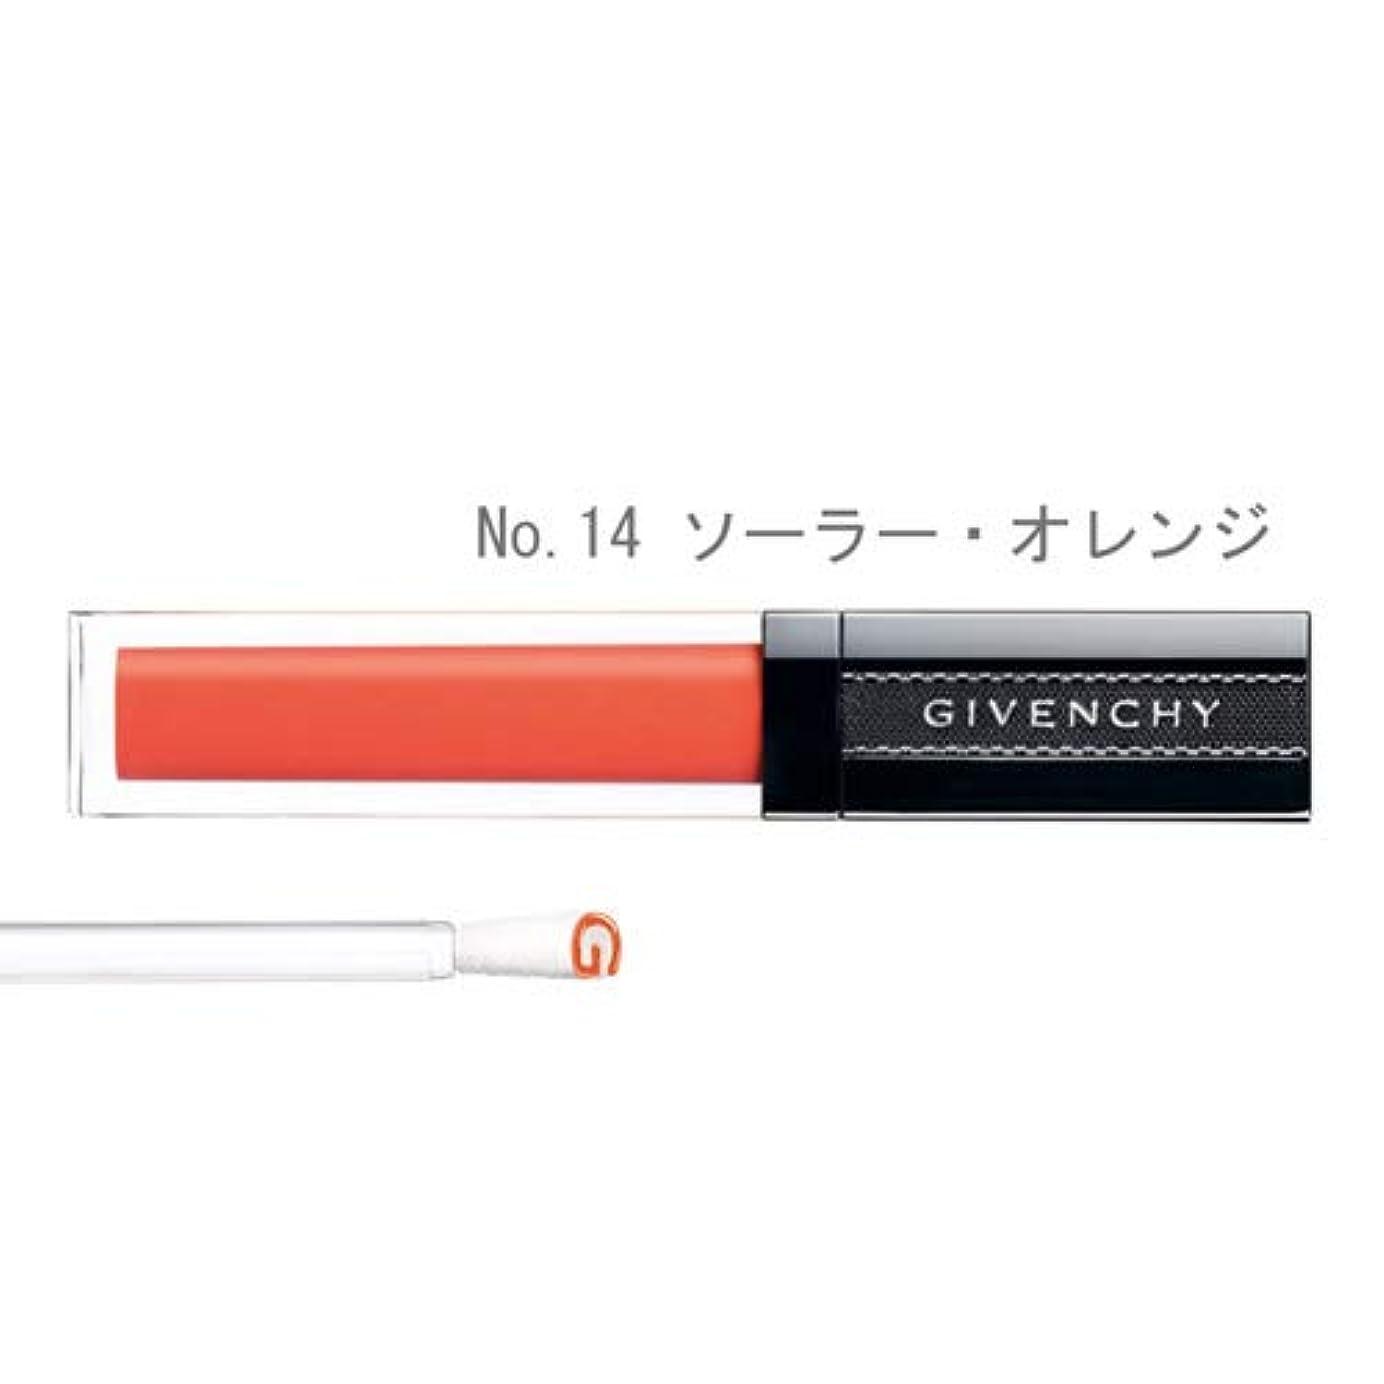 【GIVENCHY(ジバンシイ)】【国内正規品】グロス?アンテルディ (No.14 ソーラー?オレンジ)